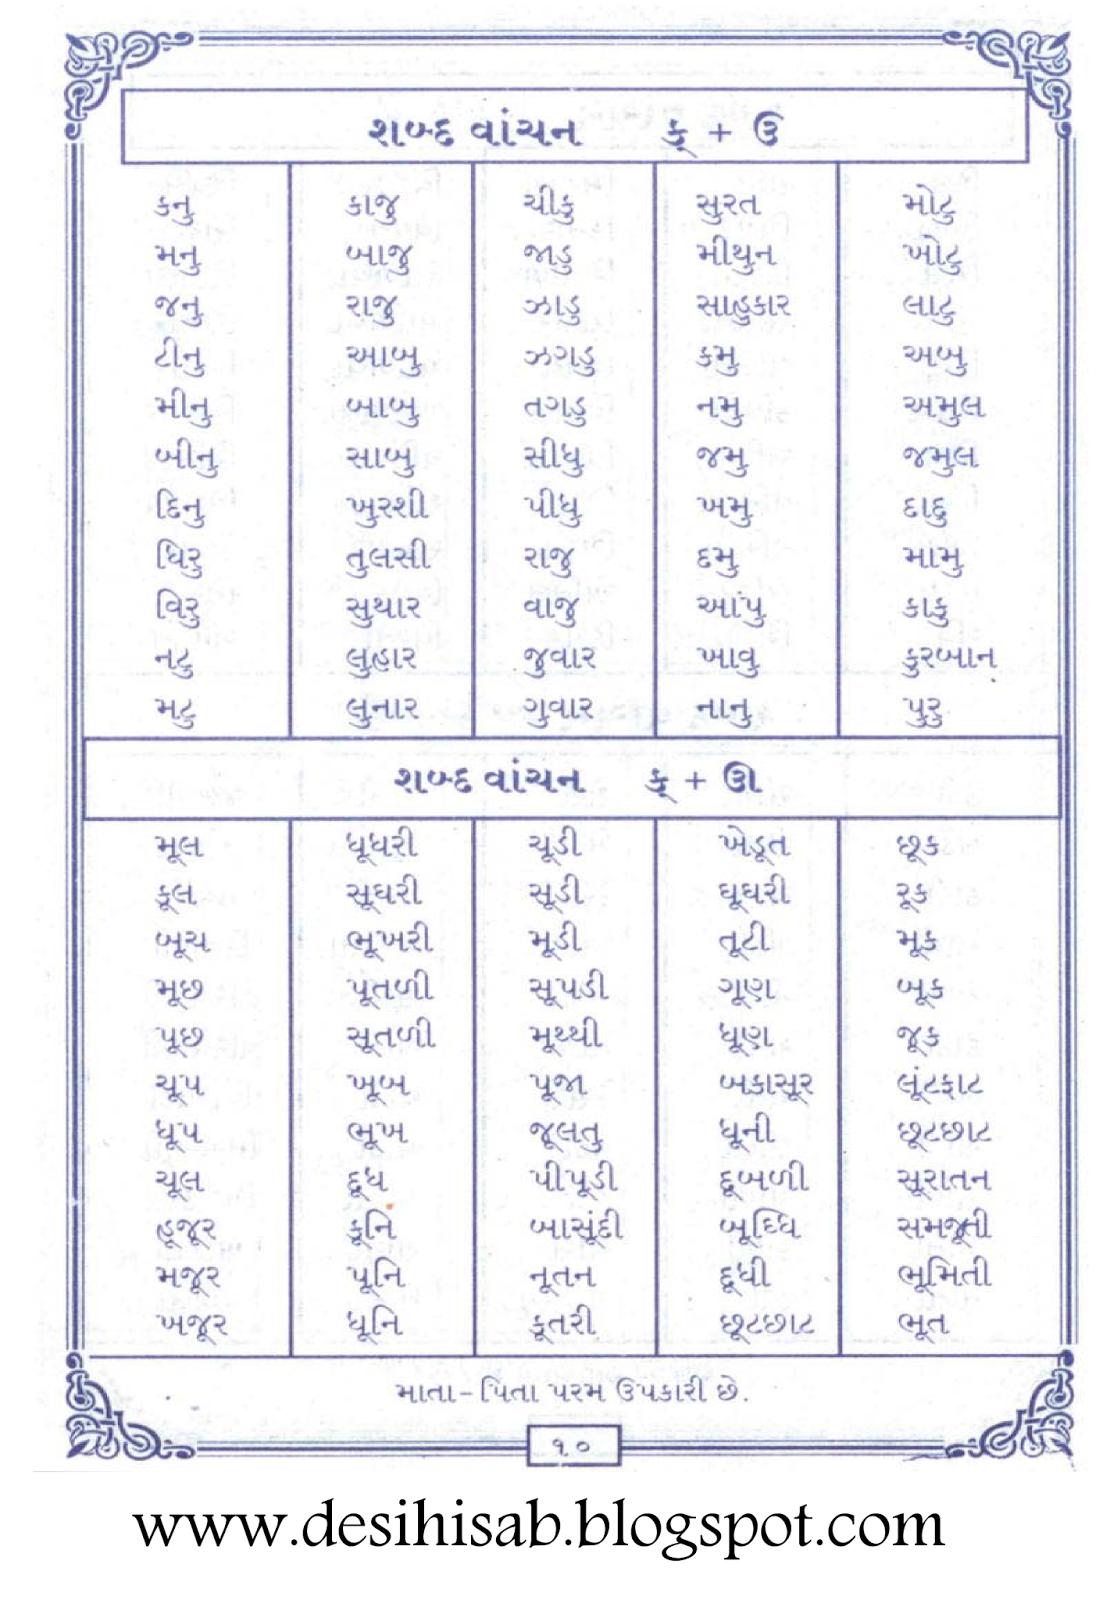 Gujarati Desi Hisab: August 2016